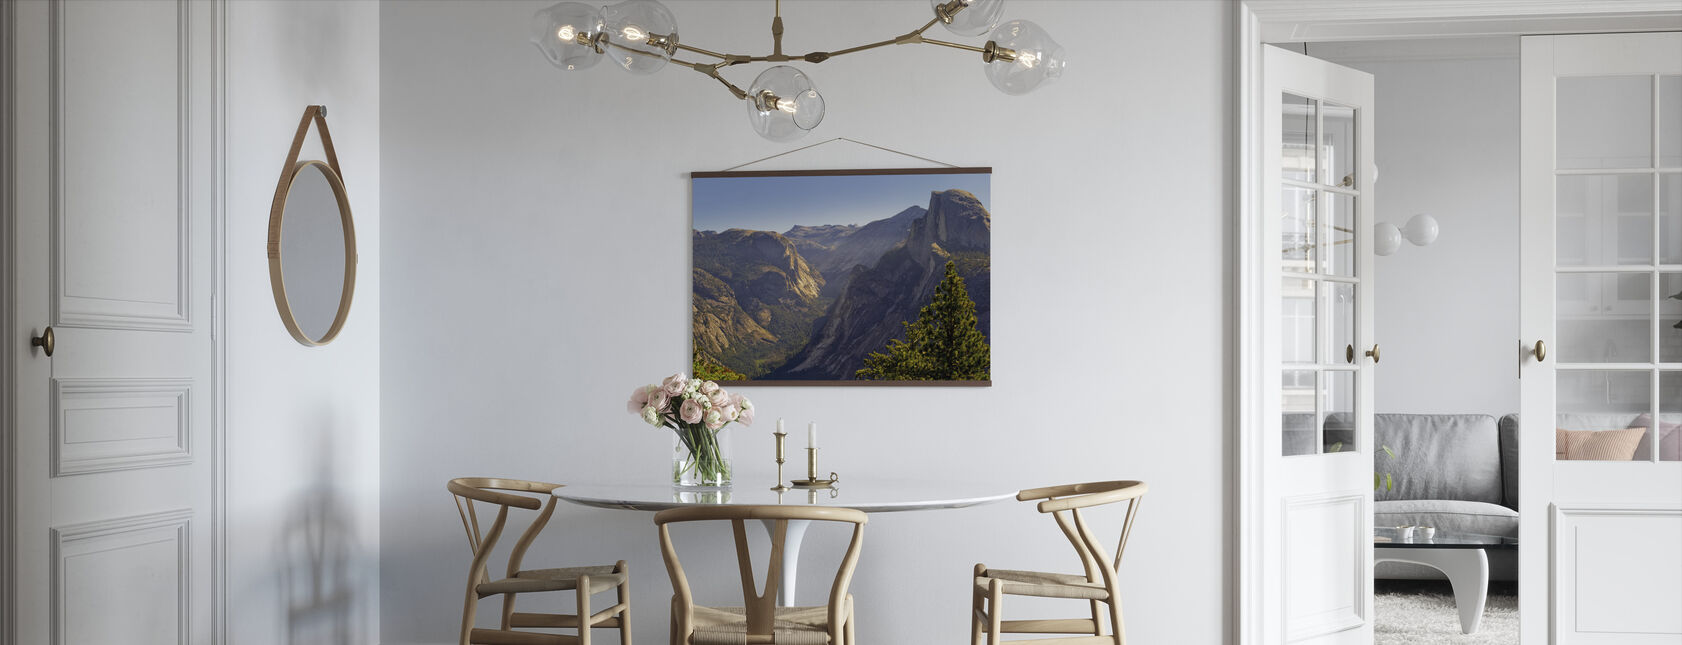 View of Tenaya Canyon - Poster - Kitchen